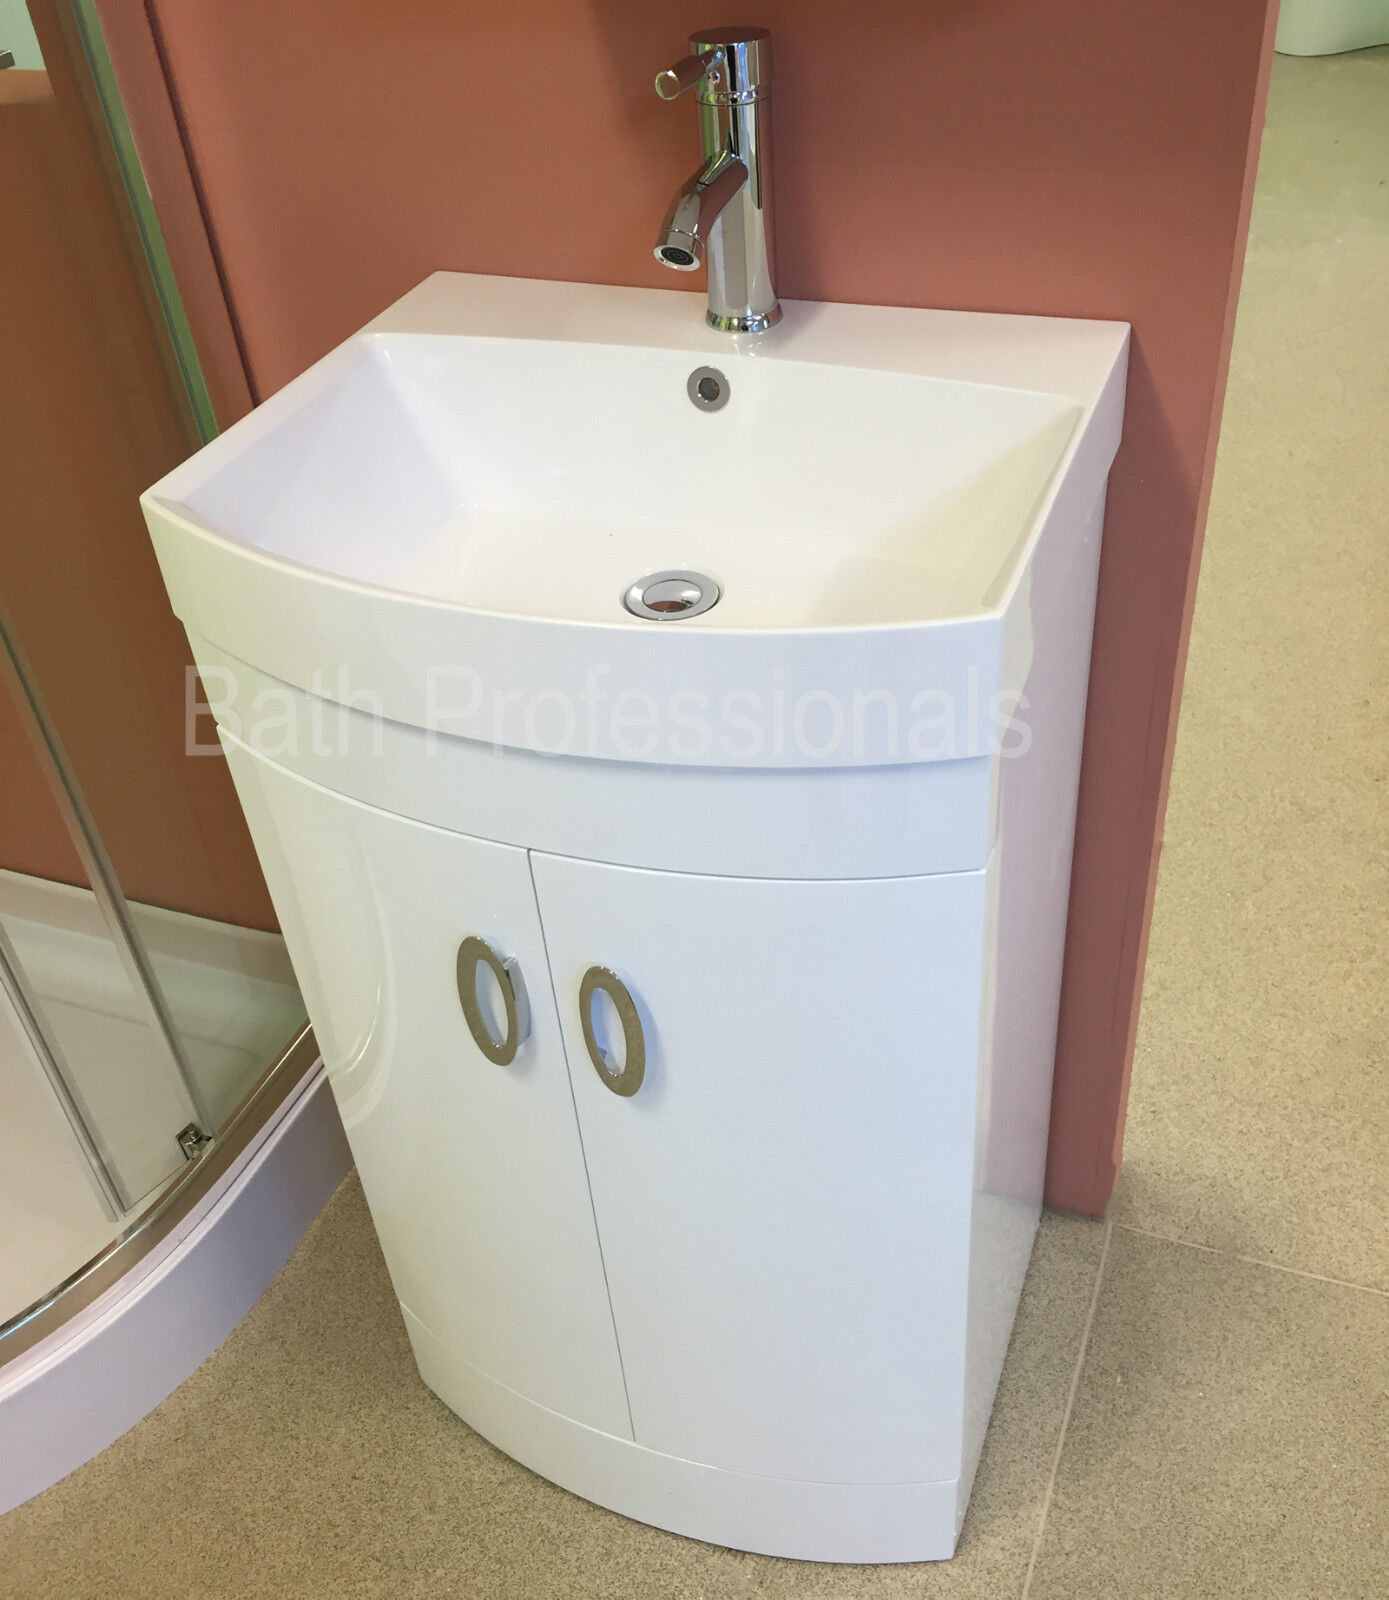 Bathroom Floor Standing Vanity Units : Vanity unit cabinet basin sink bathroom floor standing